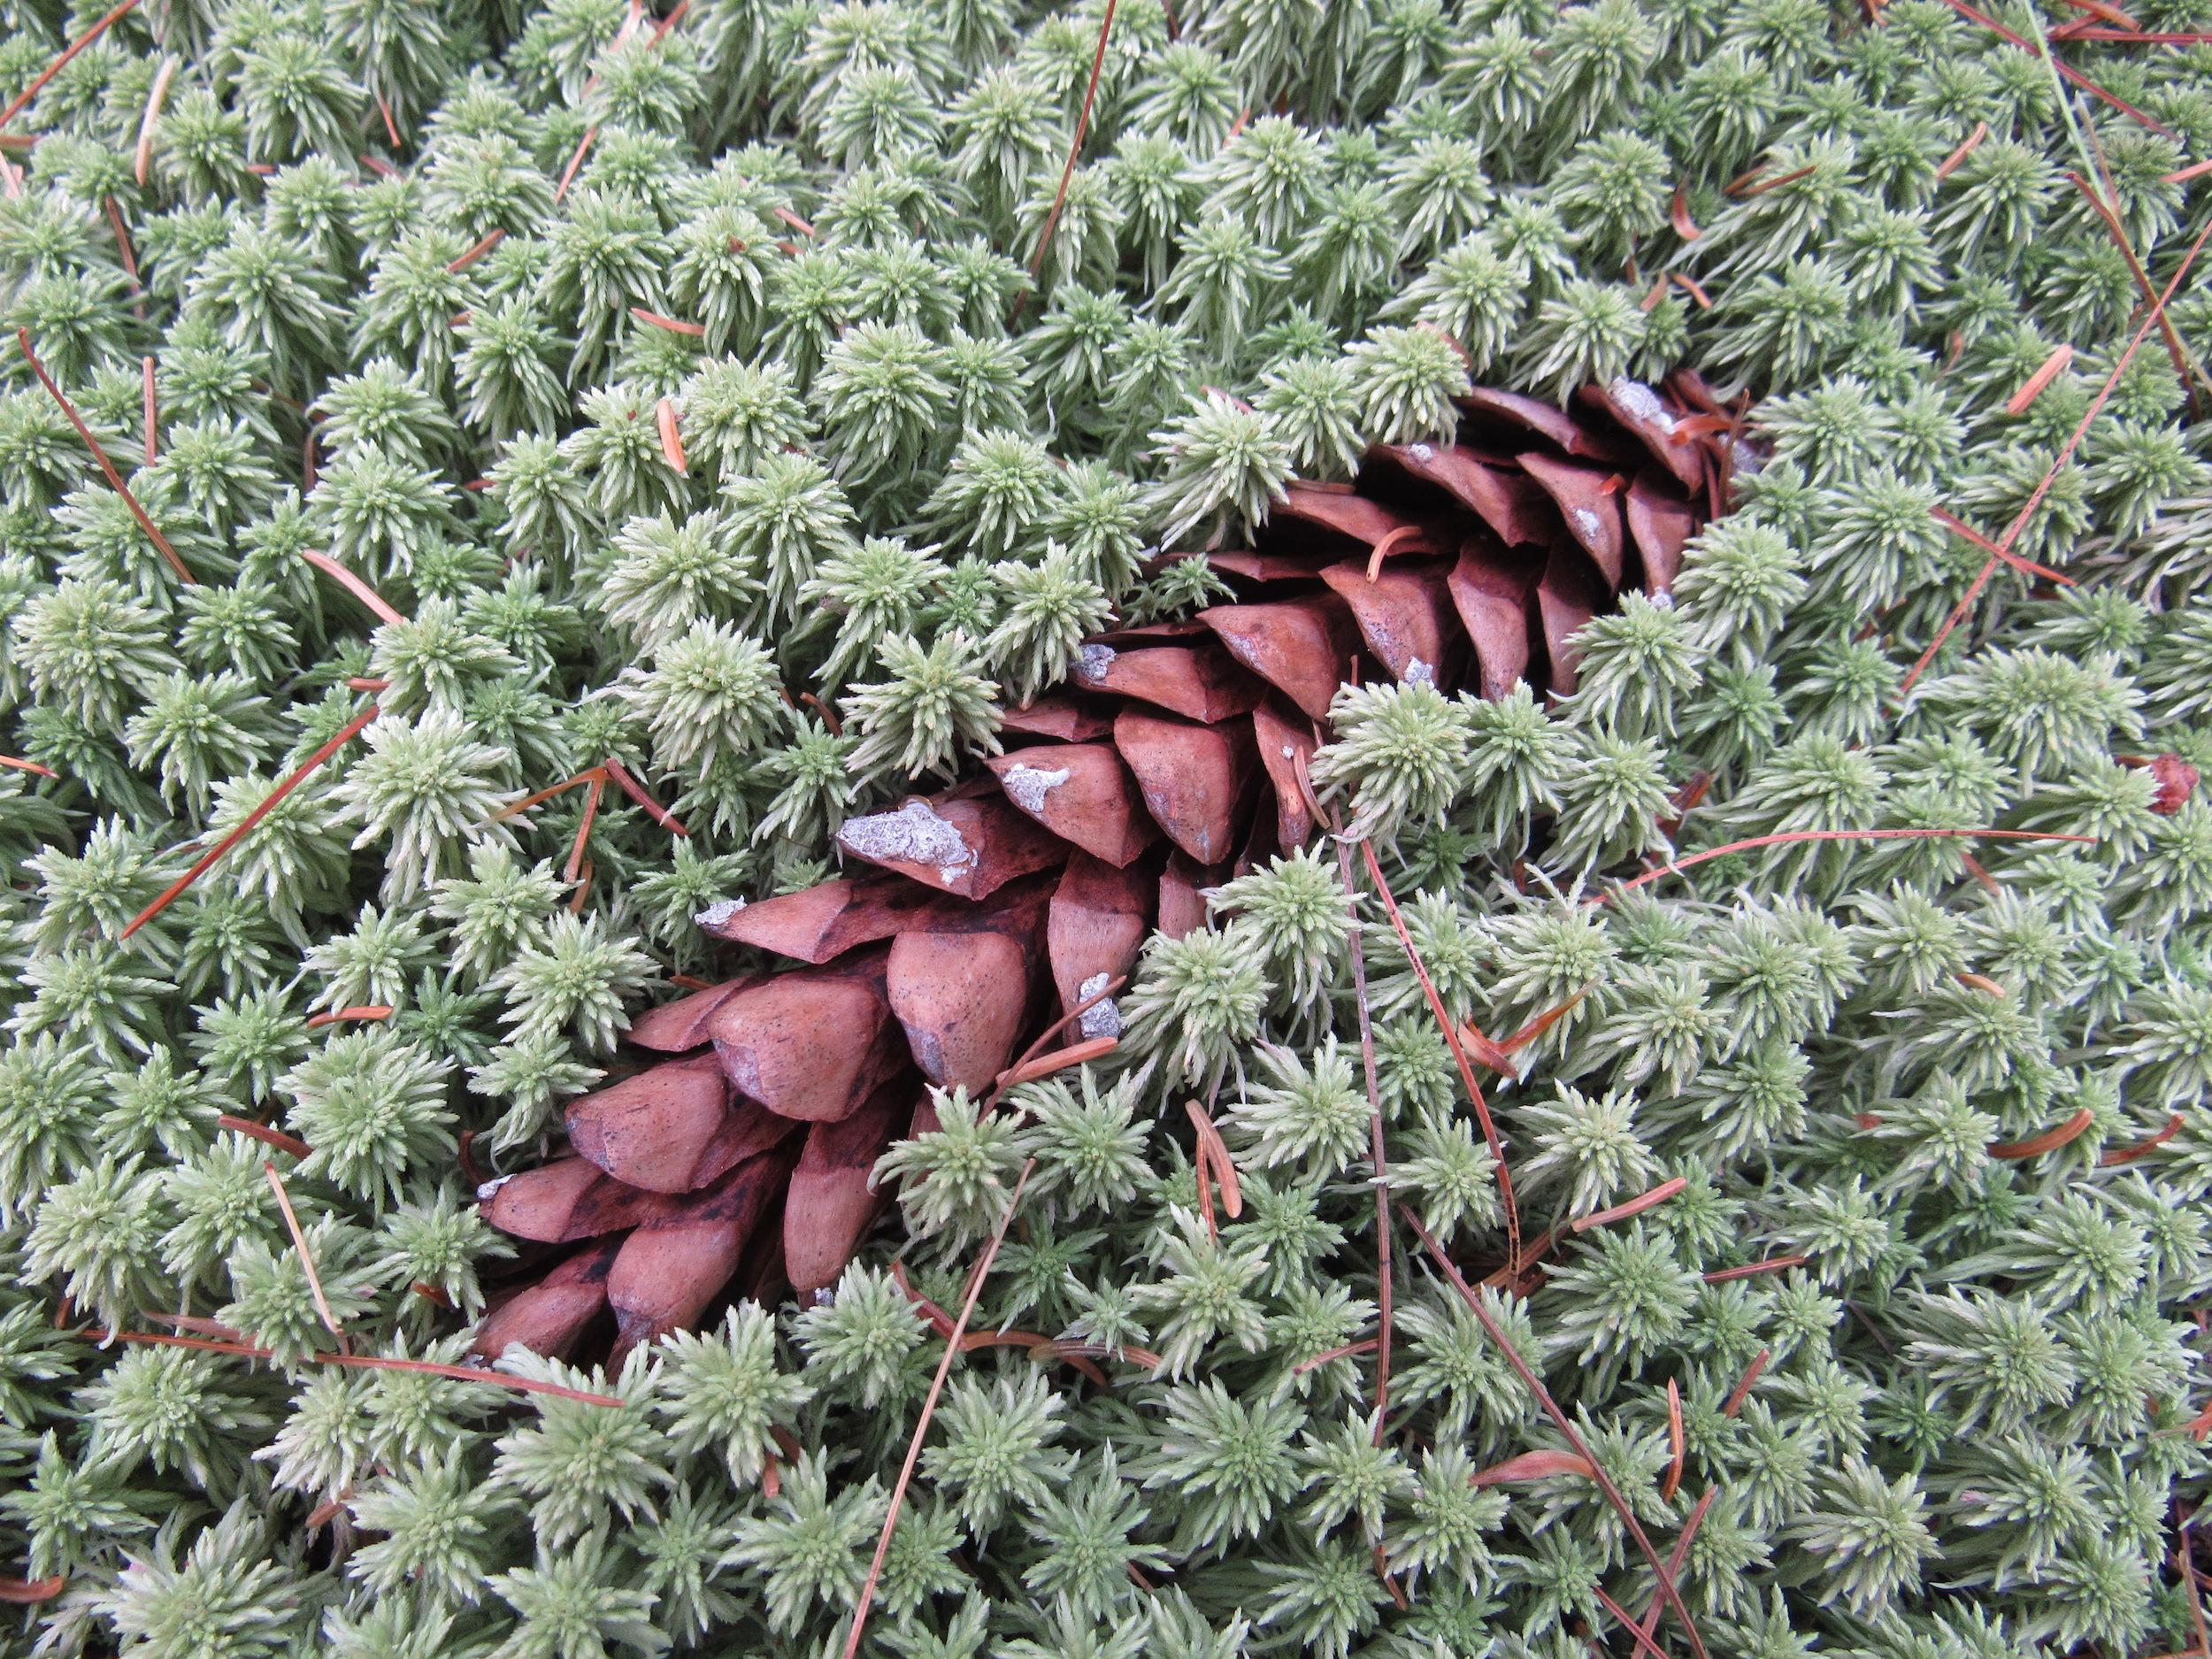 Moss cradles cone